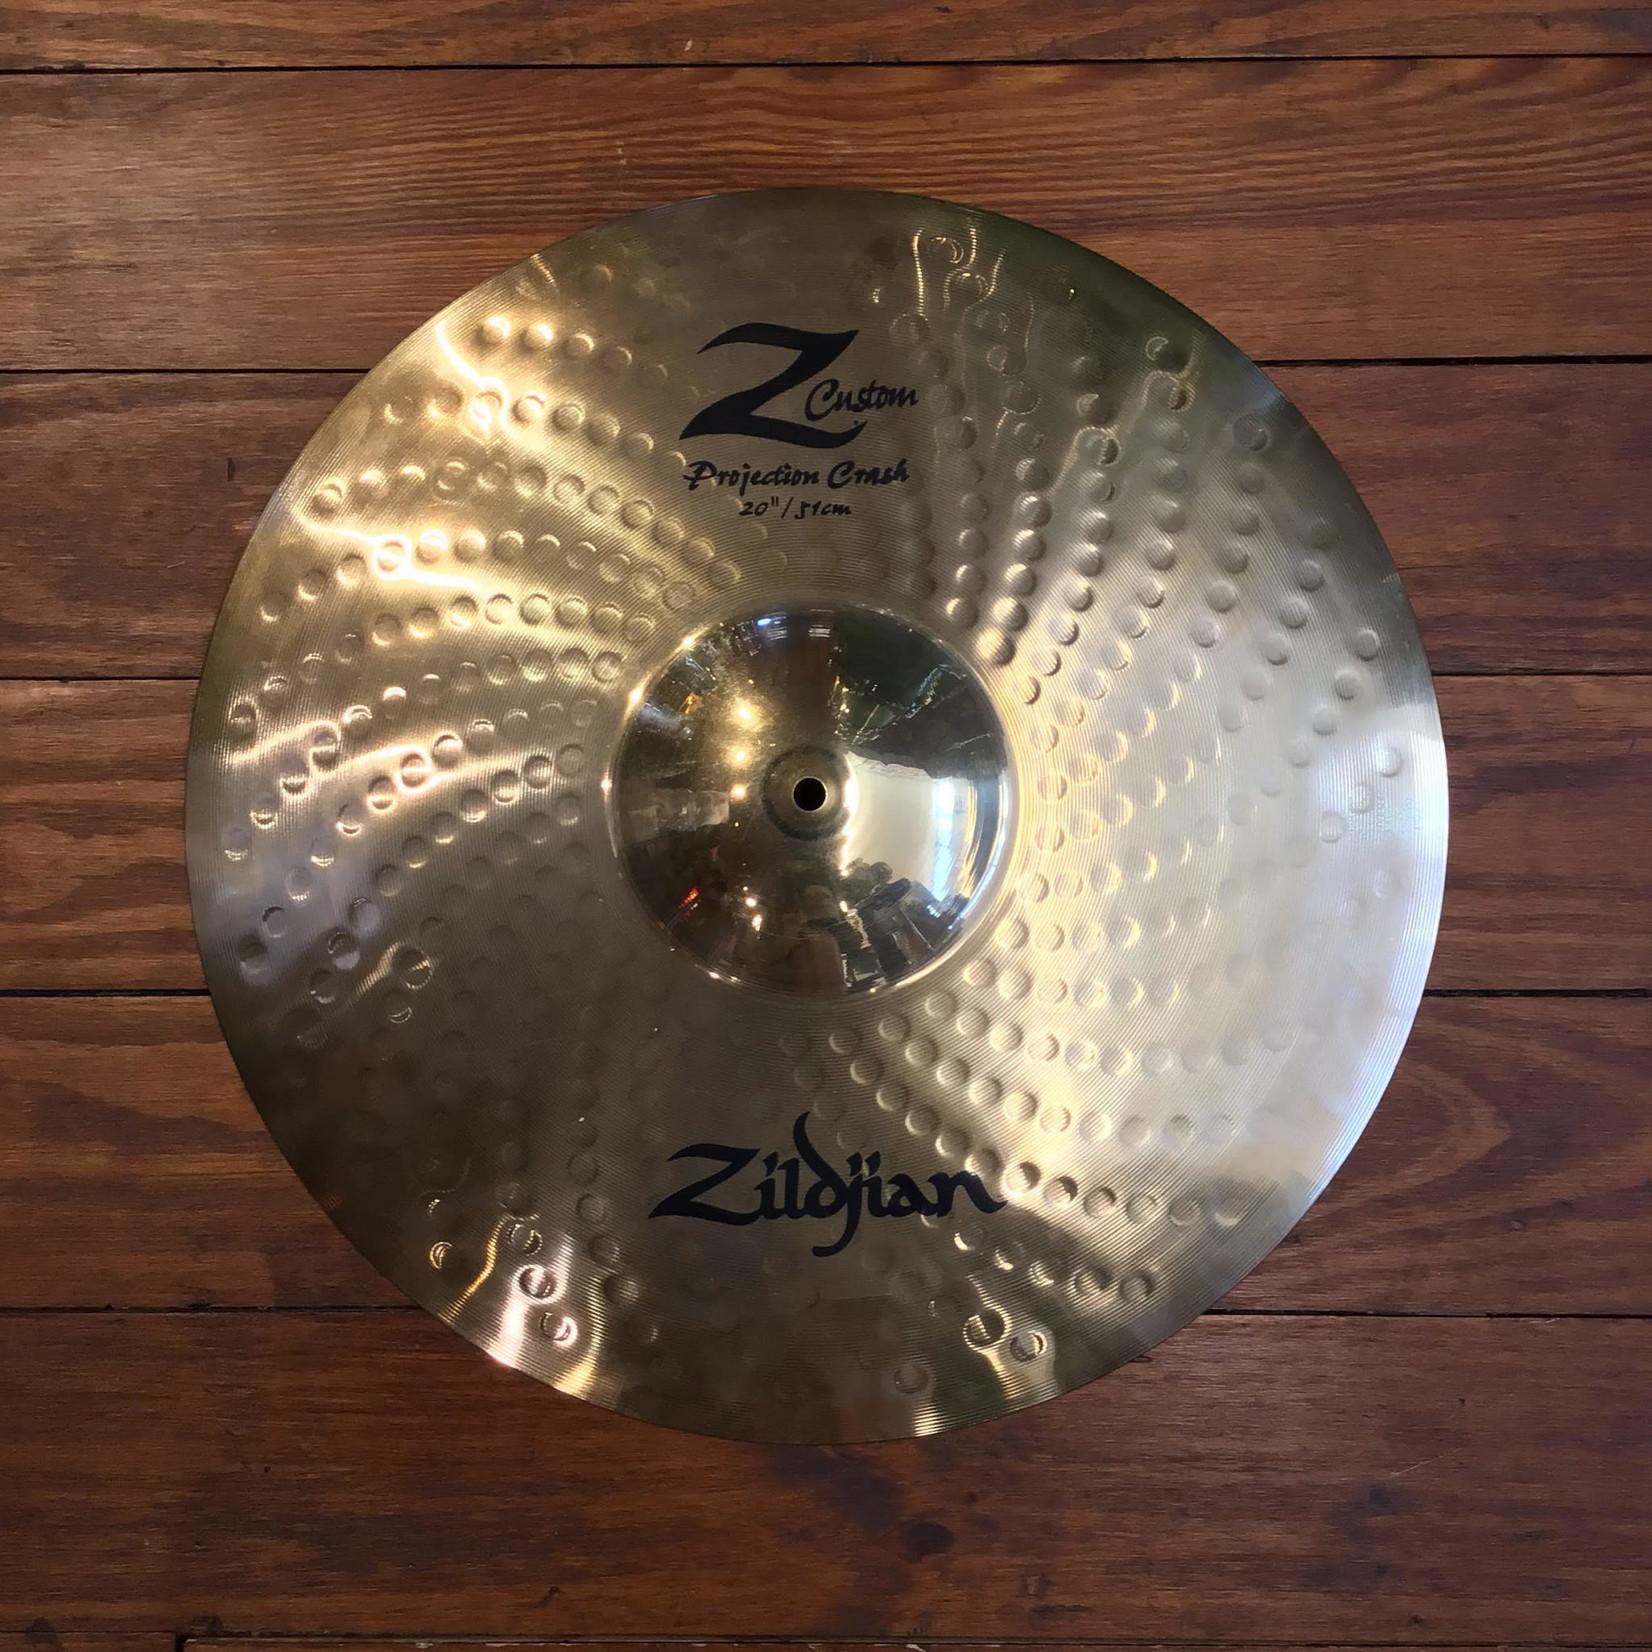 "Zildjian USED Zildjian Z Custom 20"" Projection Crash Cymbal"